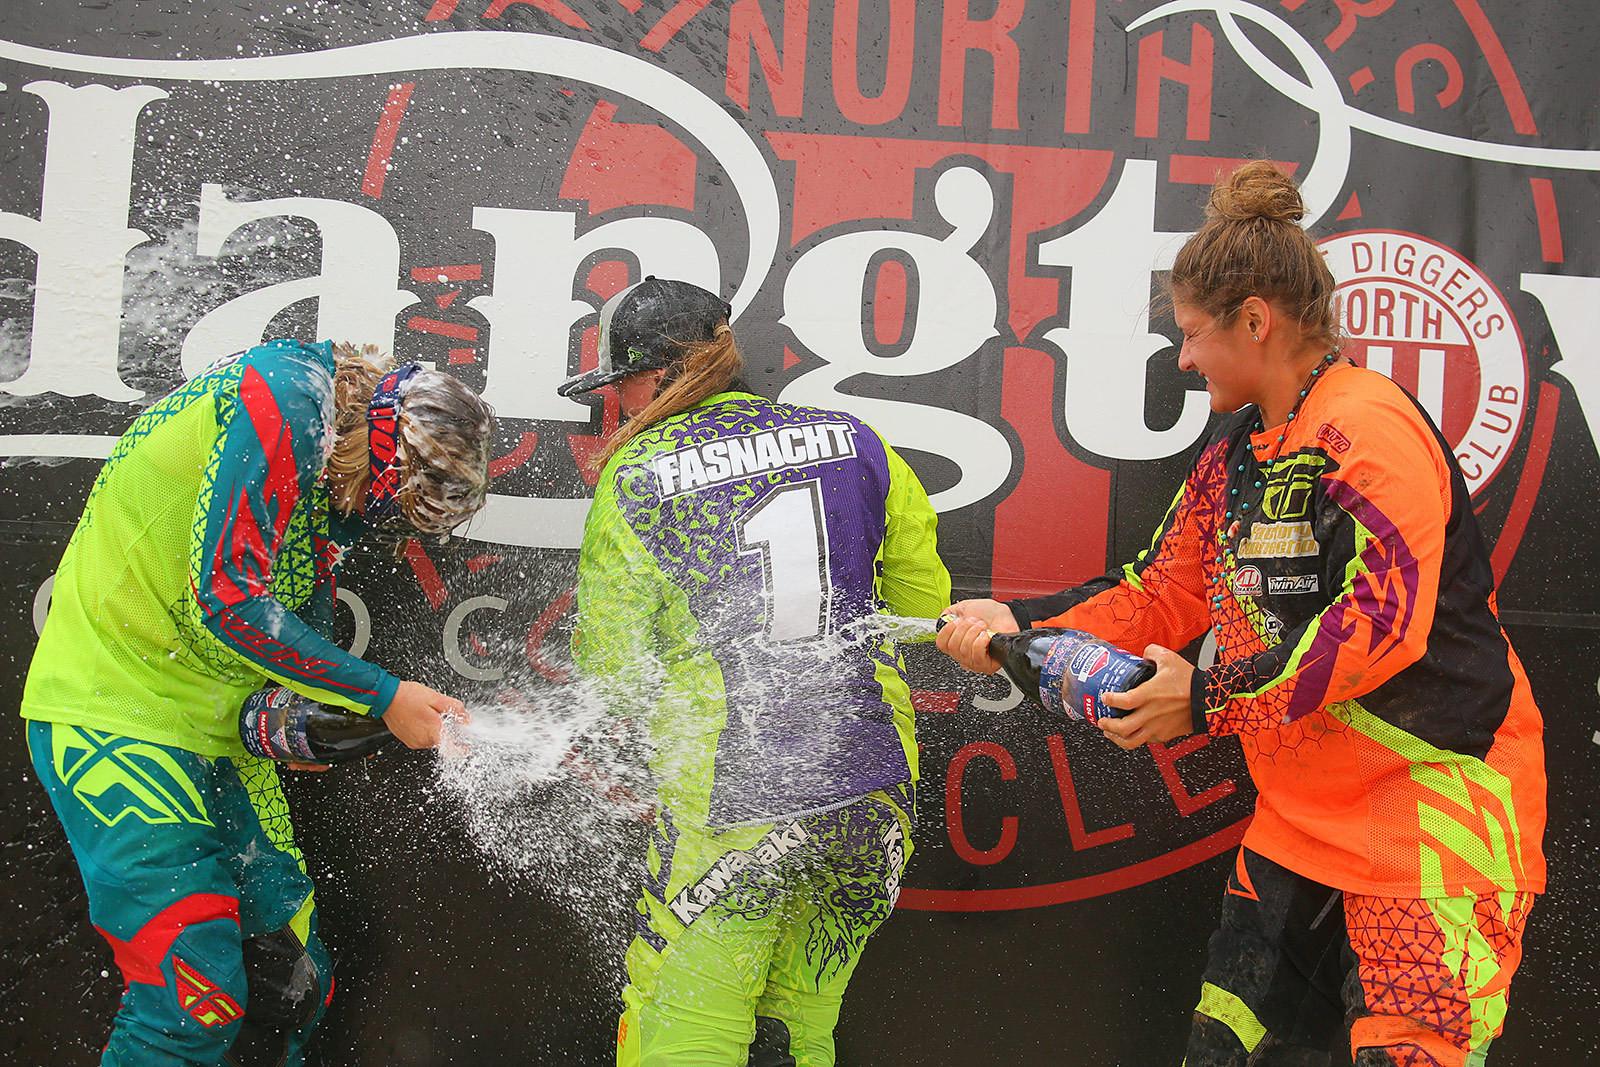 Women's MX Championship - Vital MX Pit Bits: Hangtown - Motocross Pictures - Vital MX